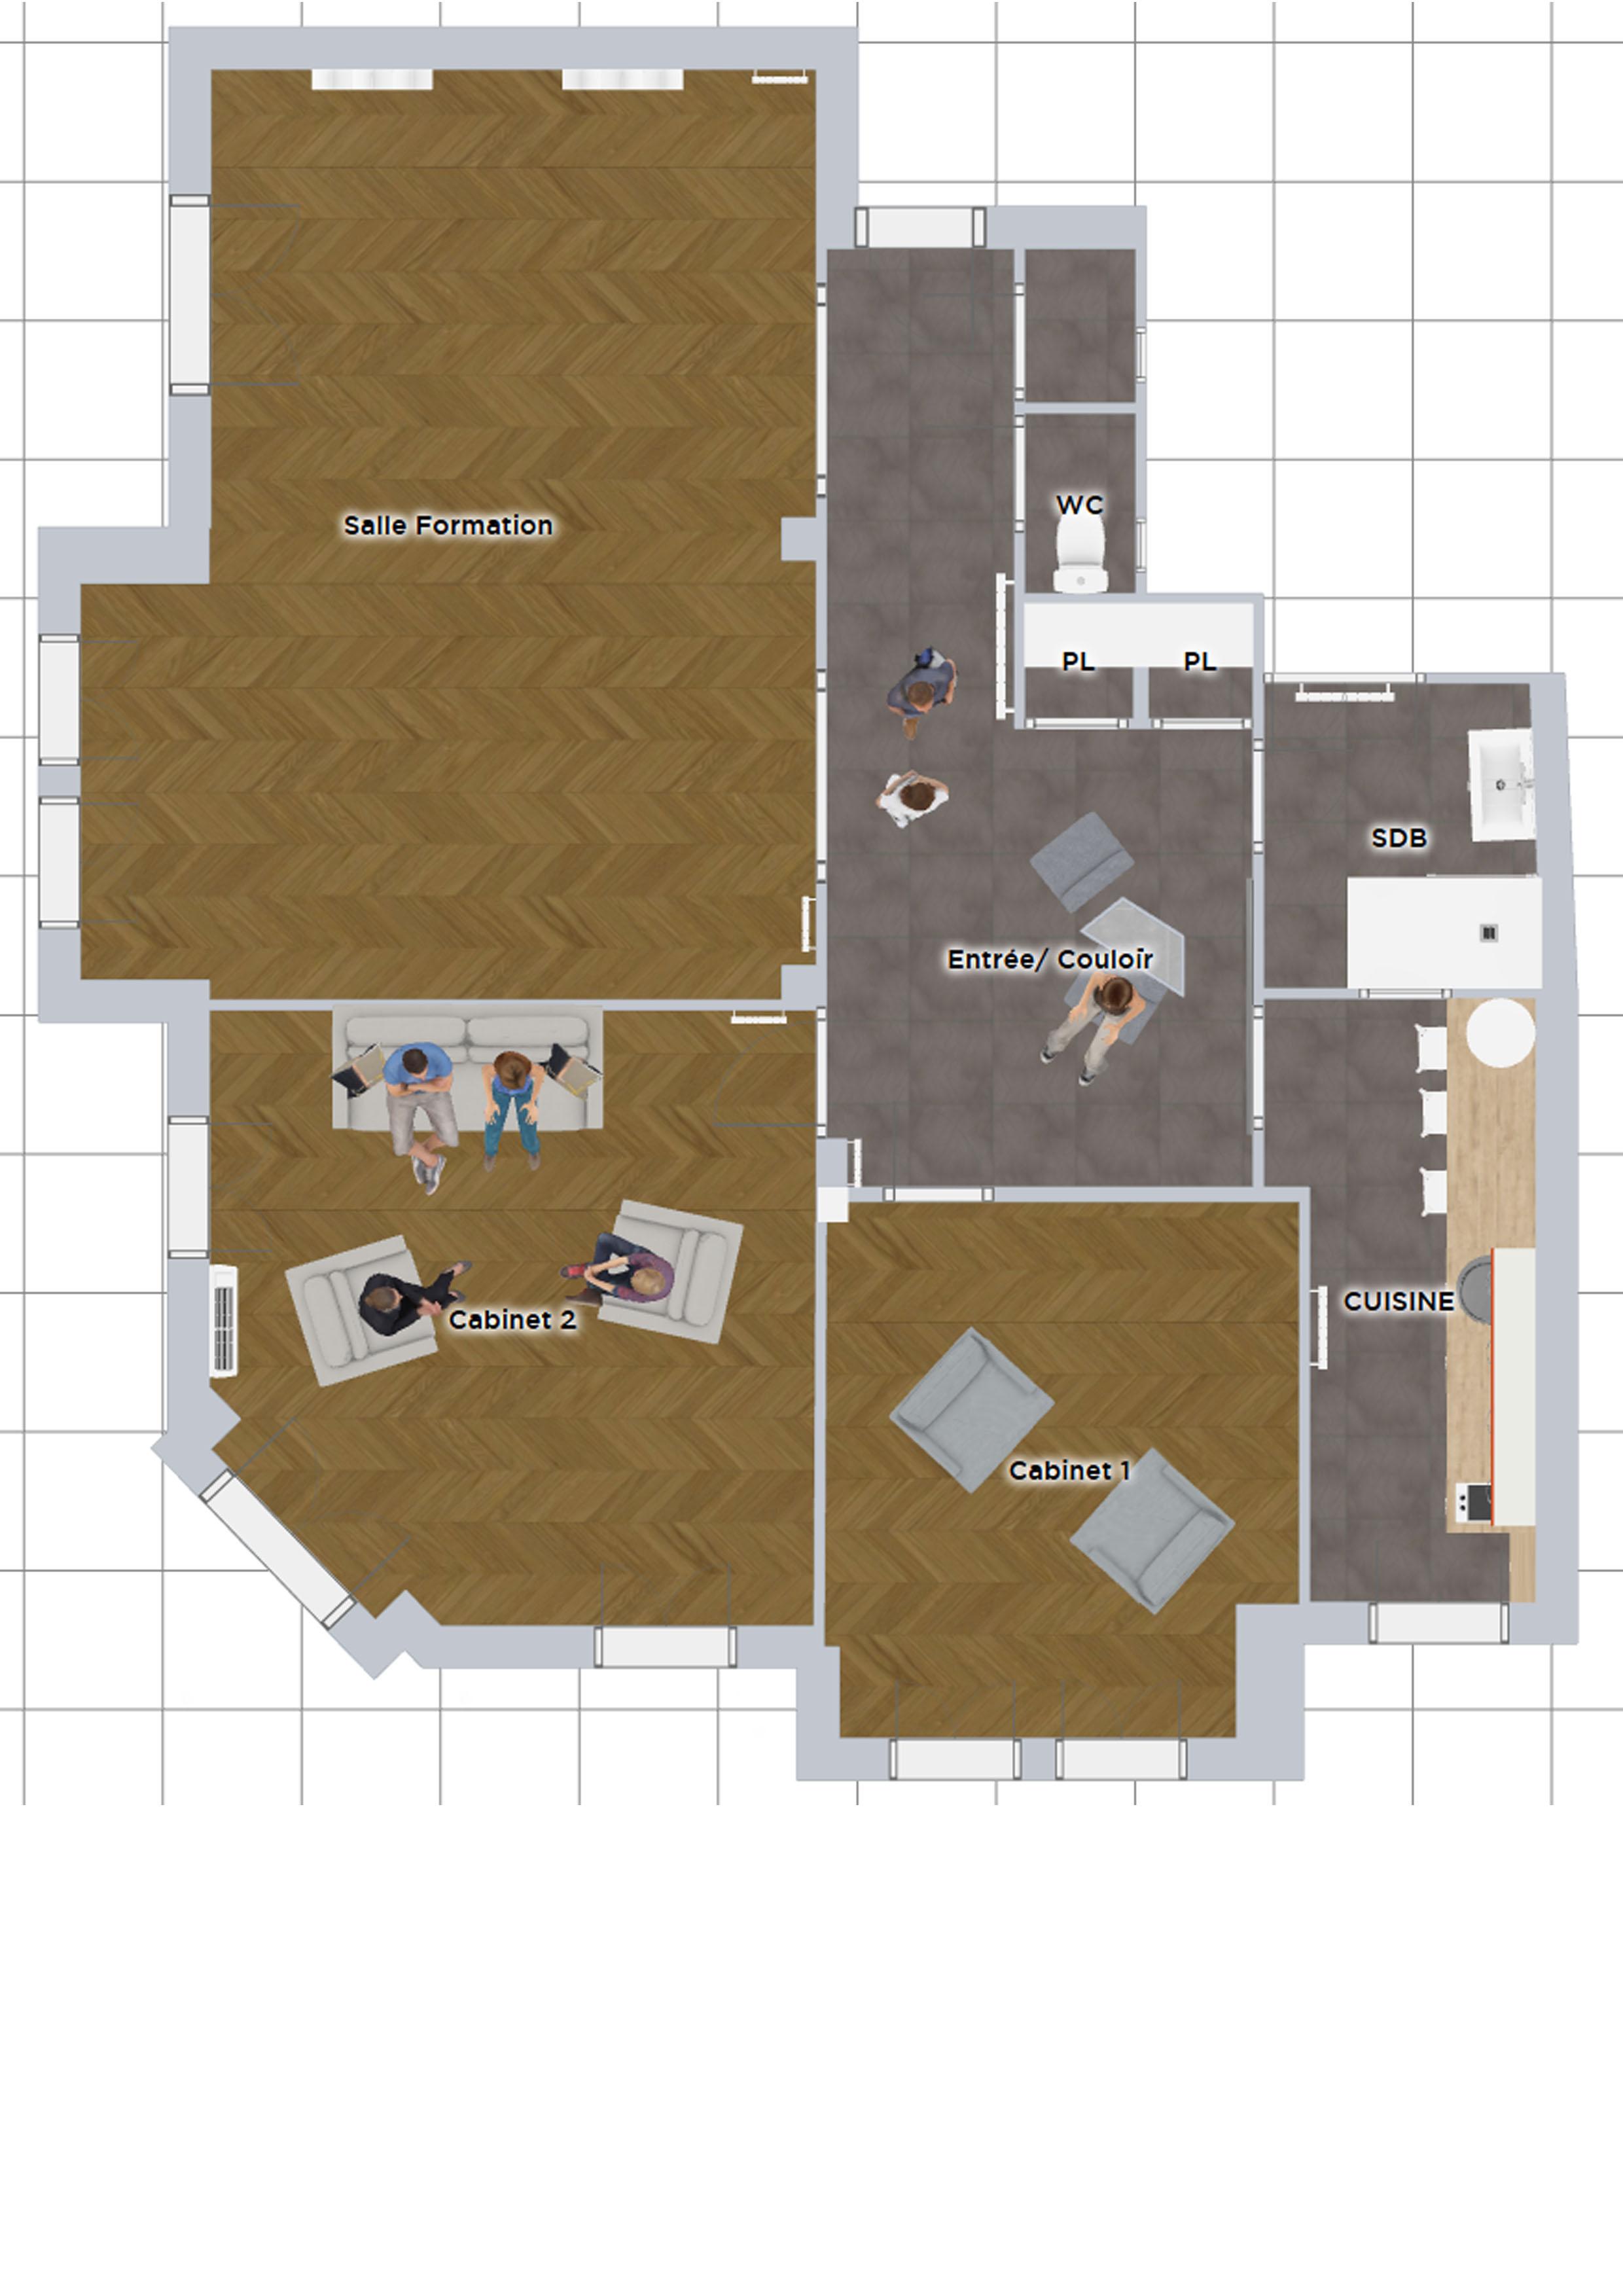 Plan 2D réaménagement intérieur